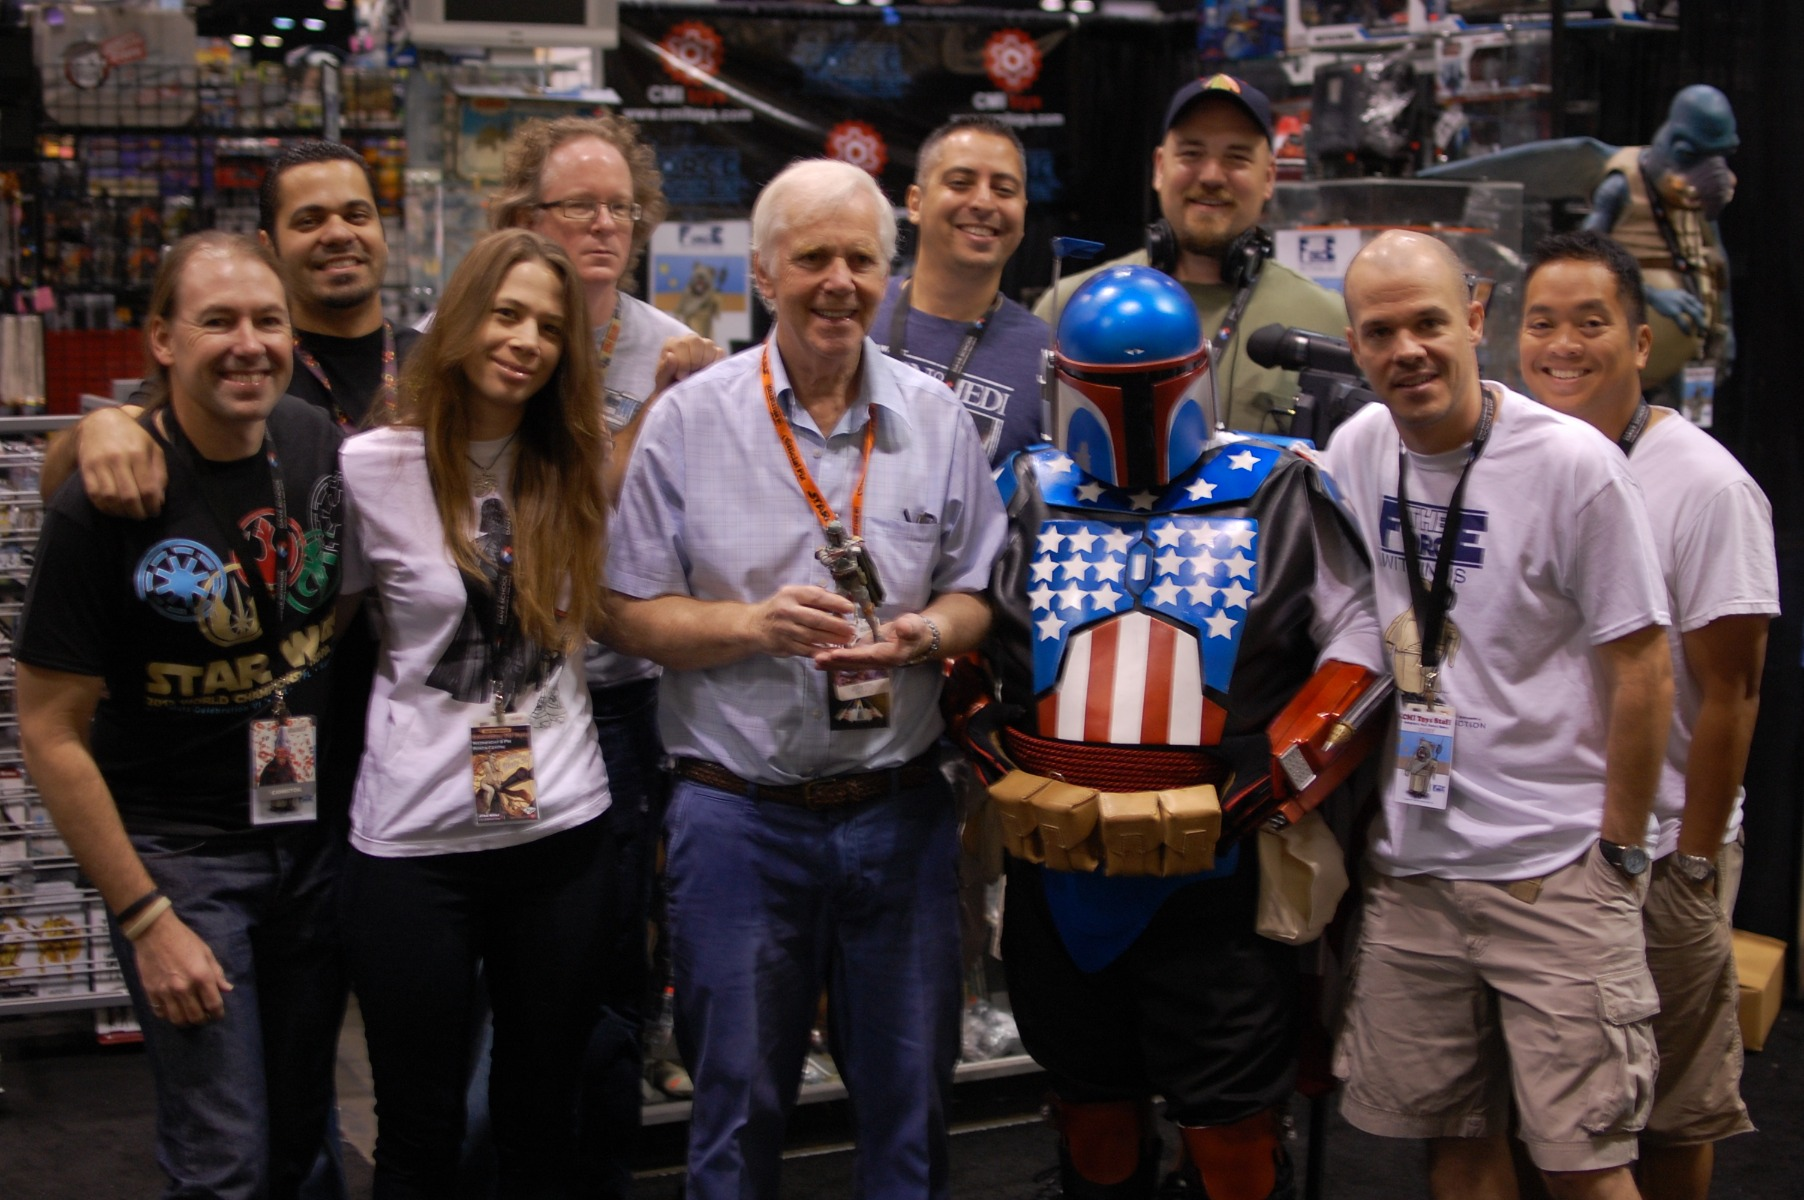 CMI Crew at Star Wars Celebration with Jeremy Bulloch